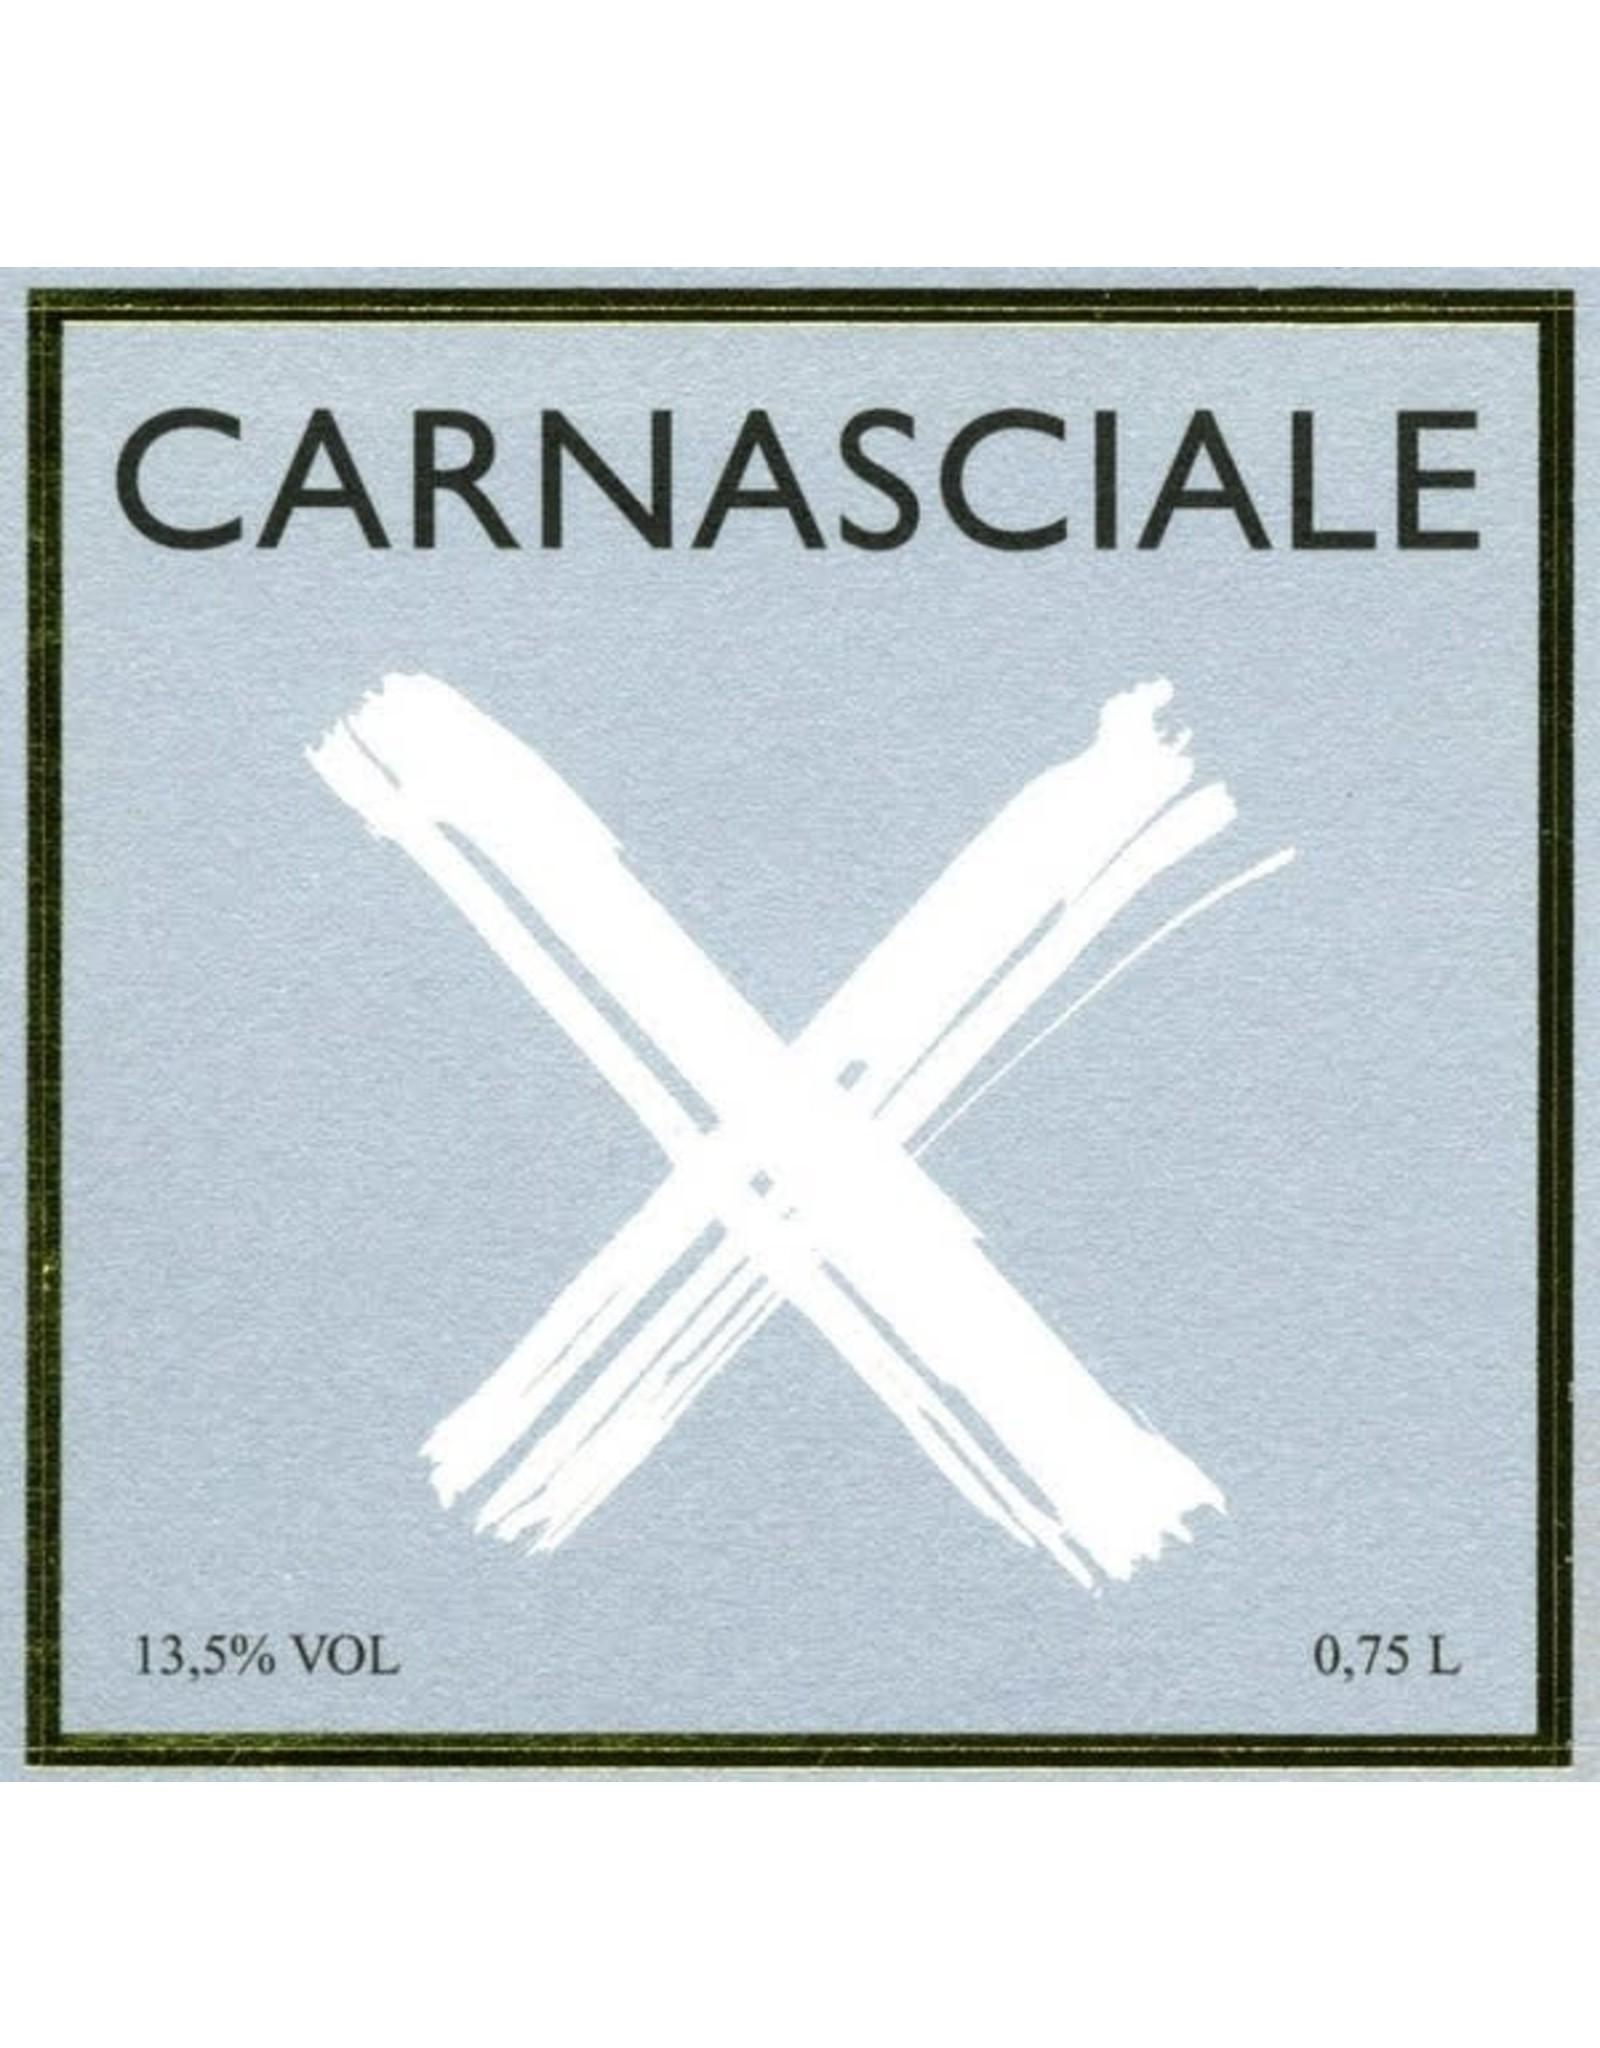 Carnasciale Toscana